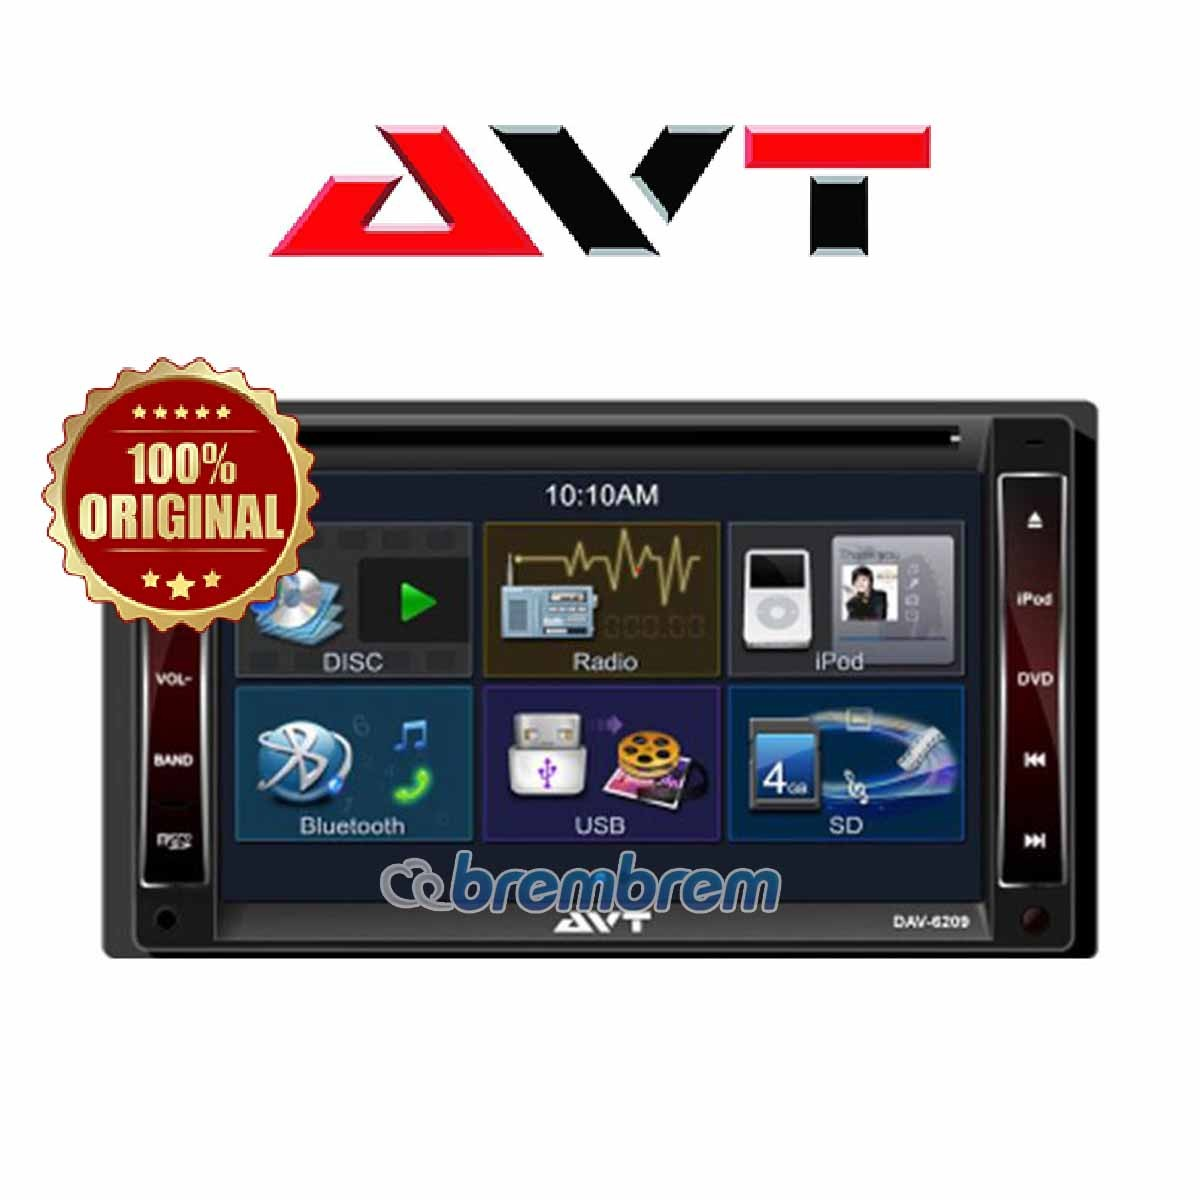 AVT DAV 6209 - HEADUNIT DOUBLE DIN